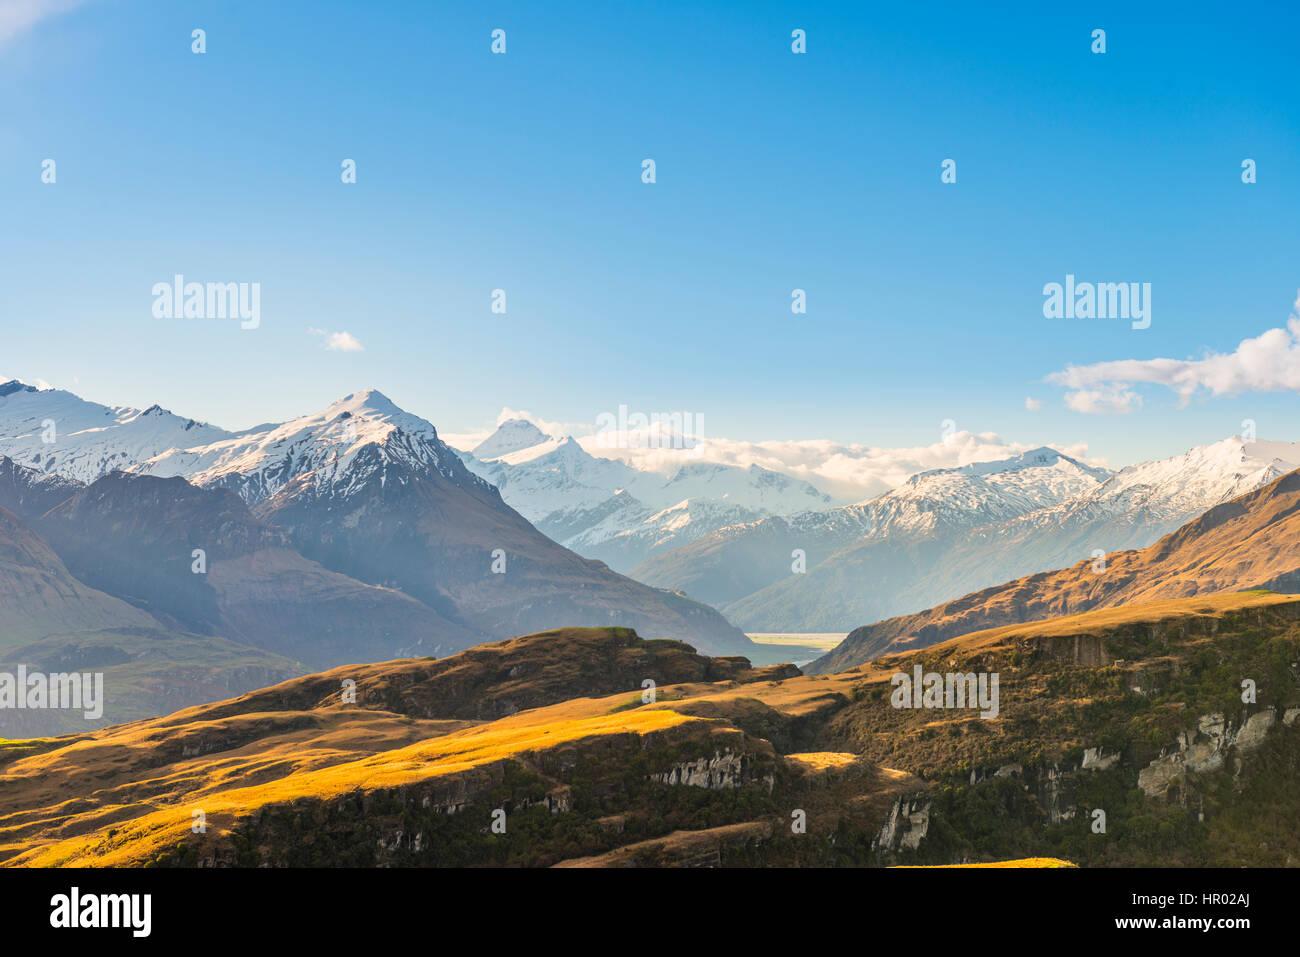 Blick auf Mount Aspiring, felsige Gipfel, Glendhu Bay, Region Otago, Südalpen, Southland, Neuseeland Stockbild